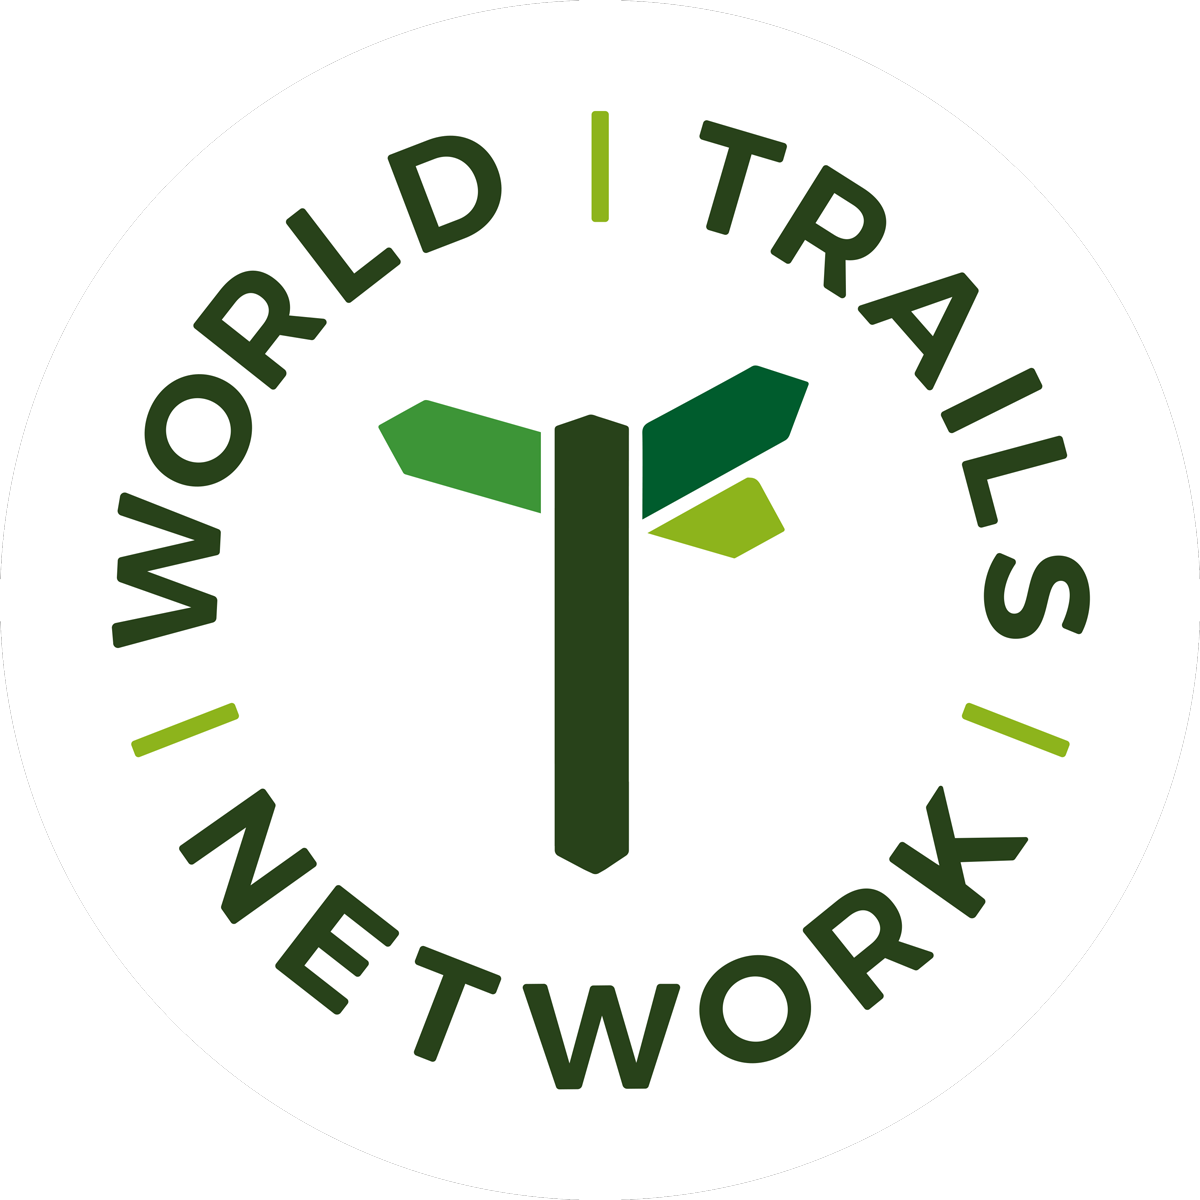 World Trails Network